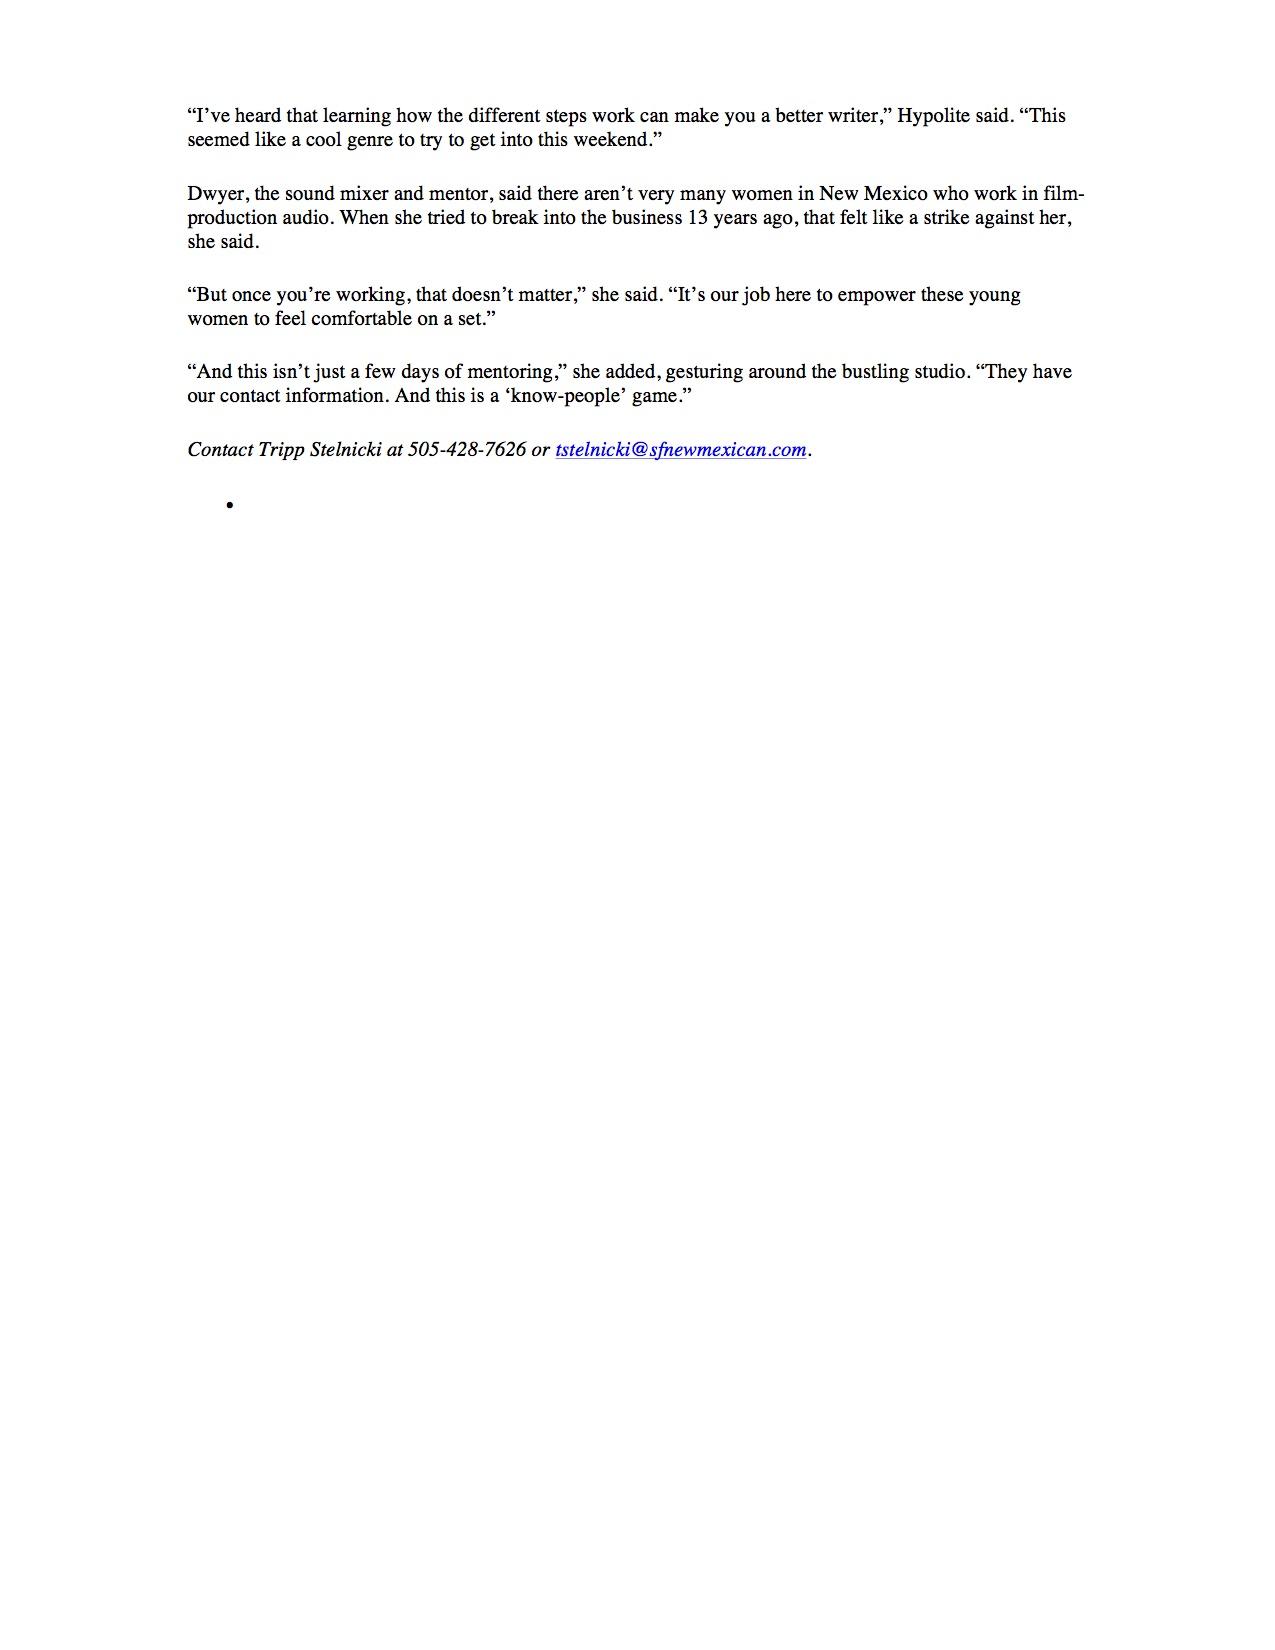 Jansons Recent Press NM 4.jpg